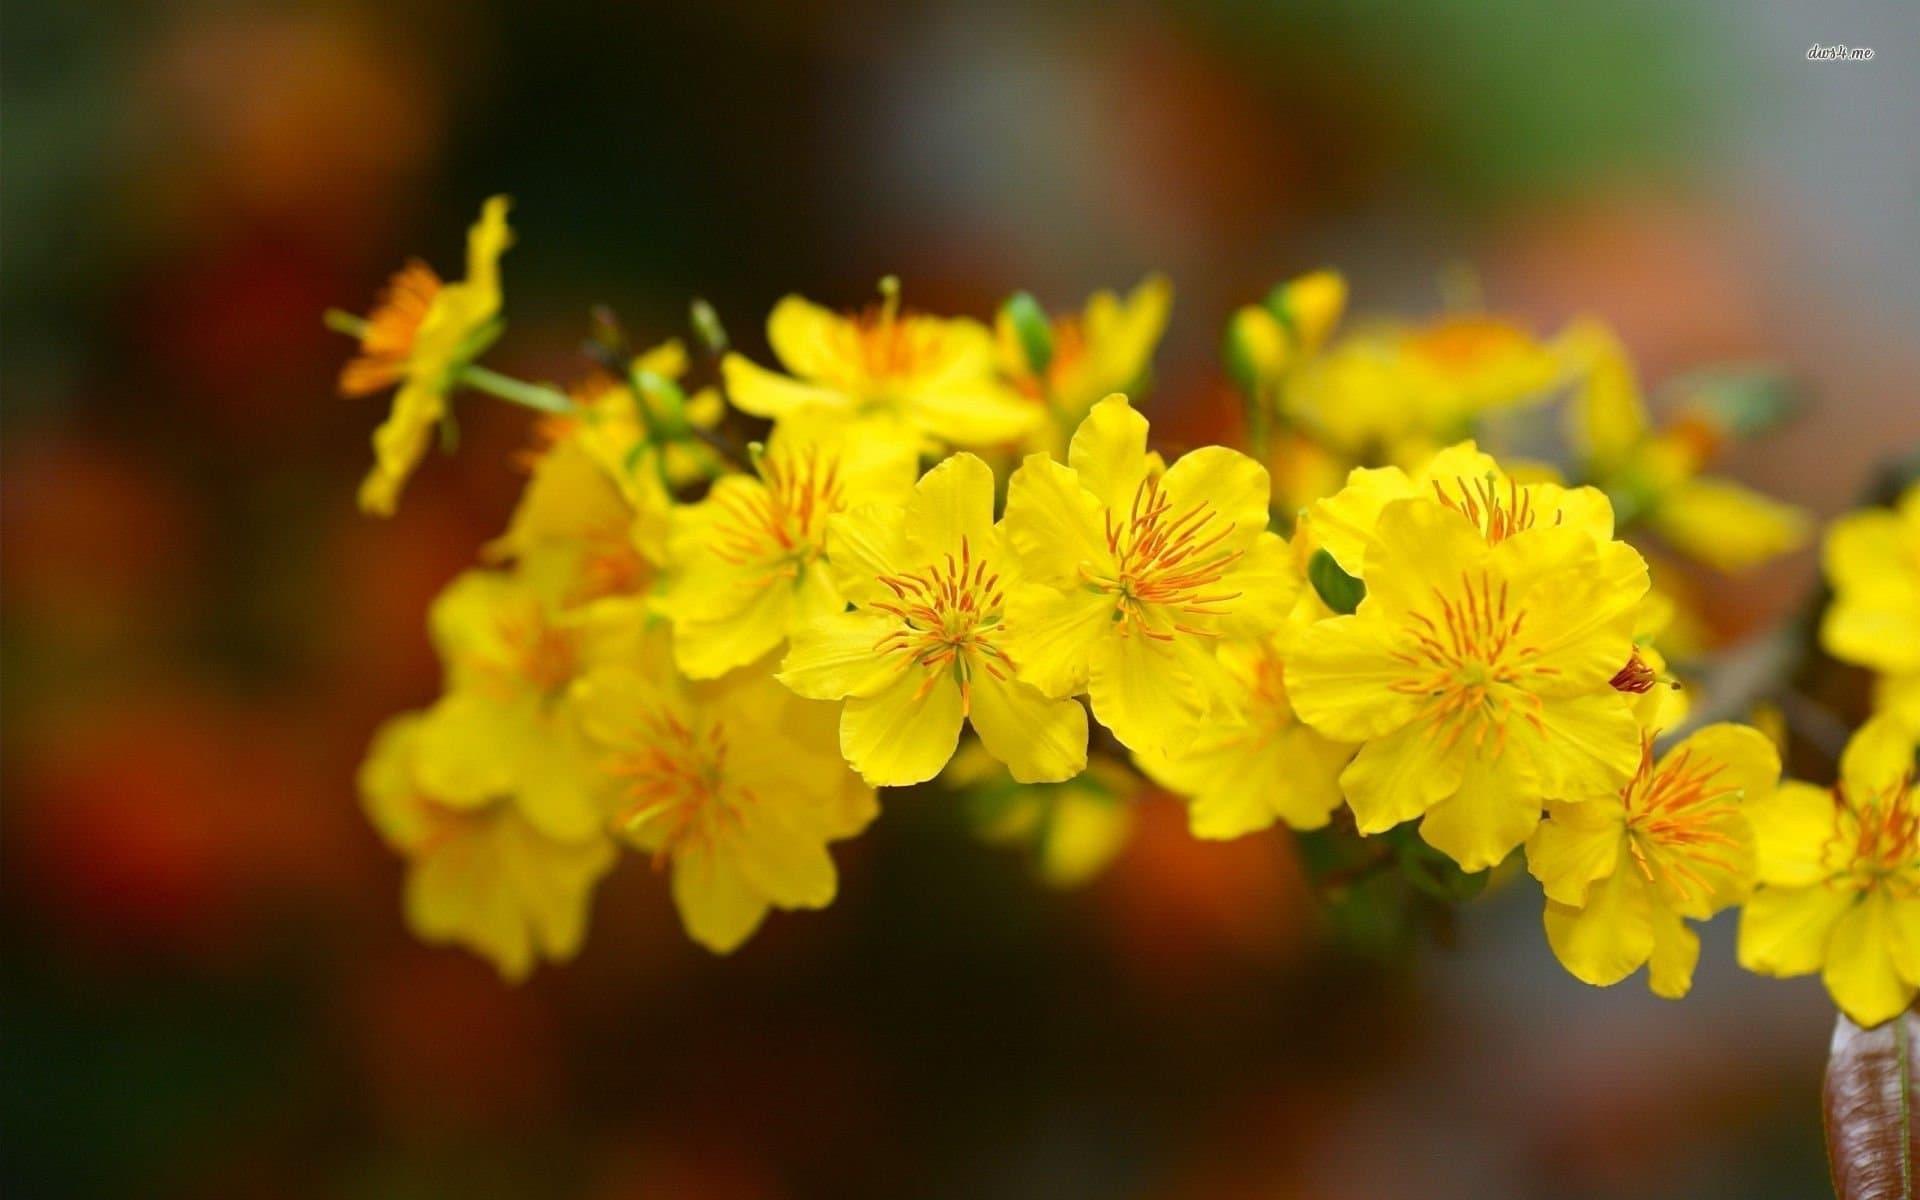 xem ảnh hoa mai đẹp